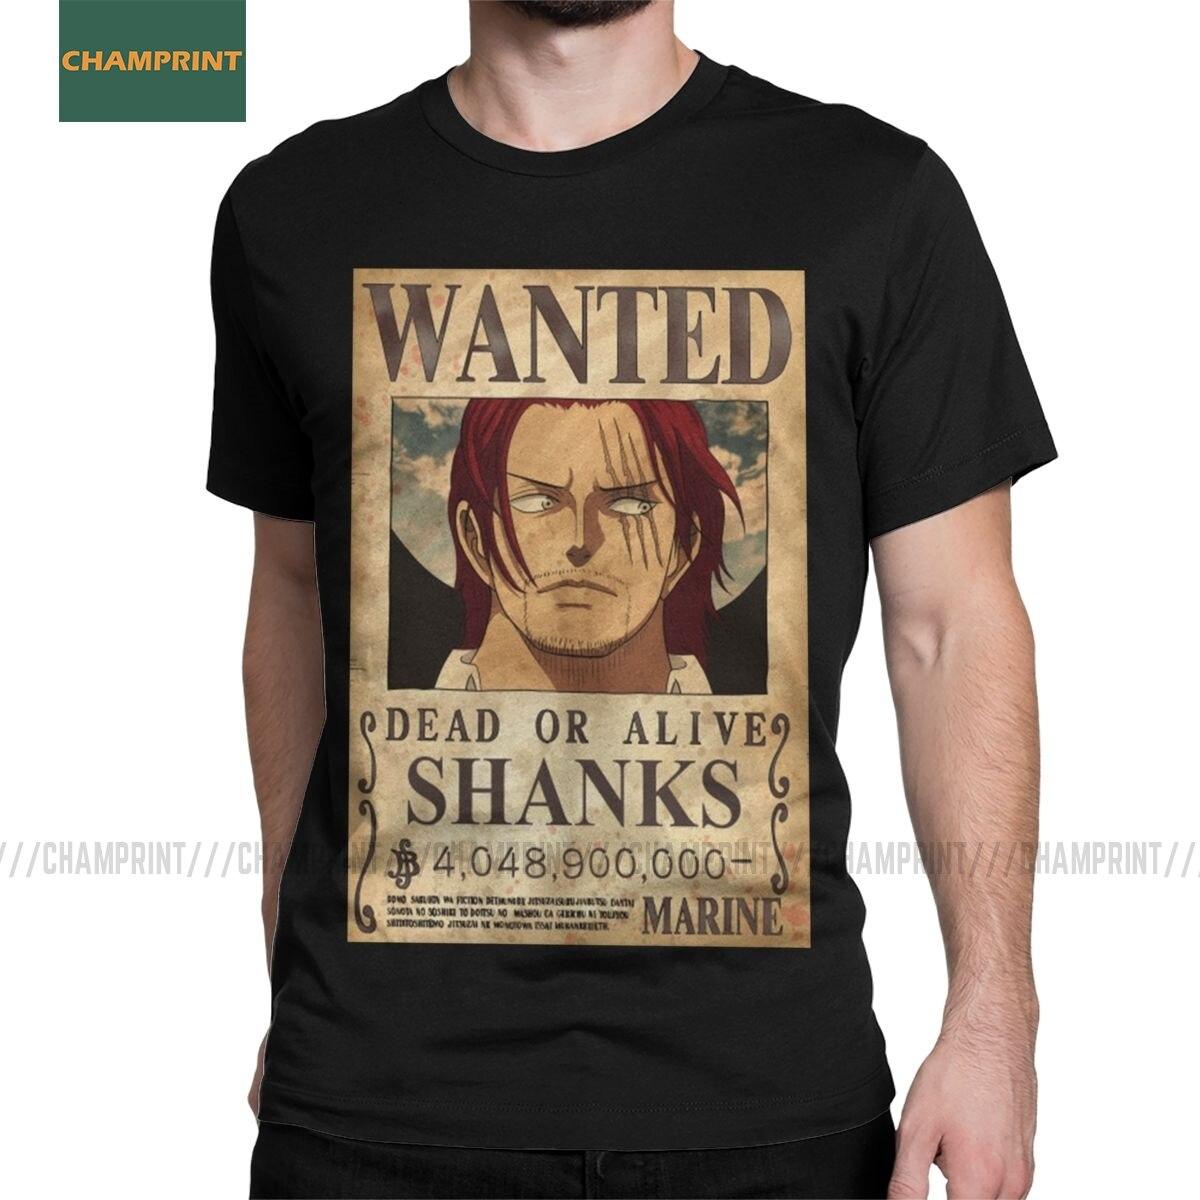 Shanks Red Hair One Piece T Shirt Men's 100% Cotton T-Shirt Luffy Zoro Japan Anime Pirates Tee Shirt Short Sleeve Tops Printed